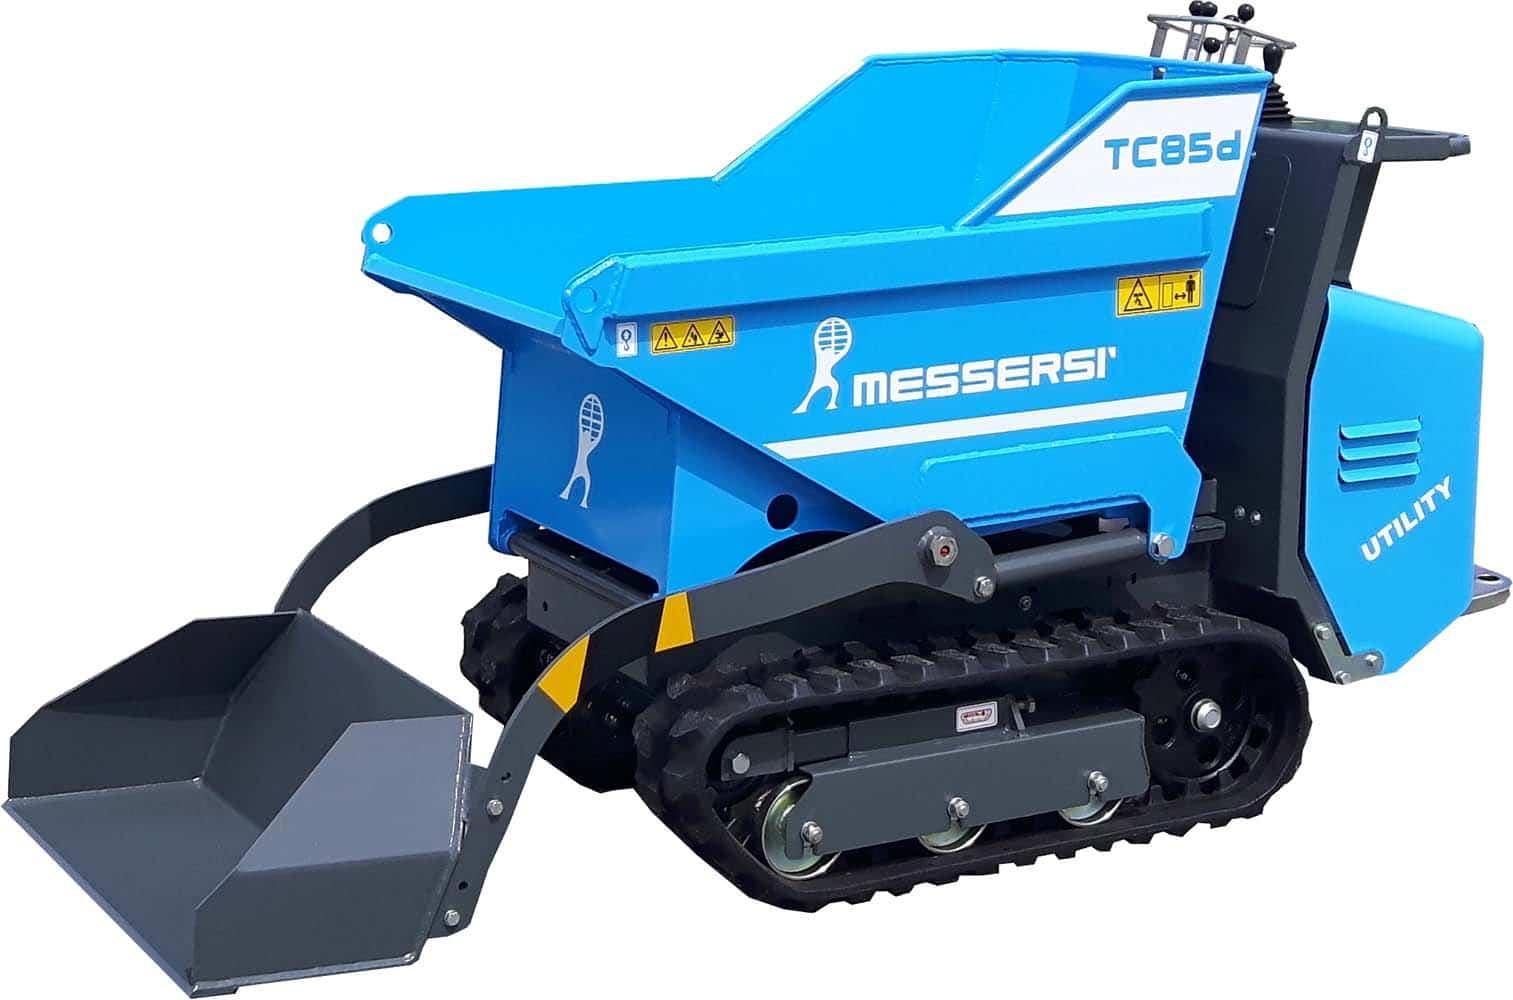 Pásový minidumper Messersi TC 85d